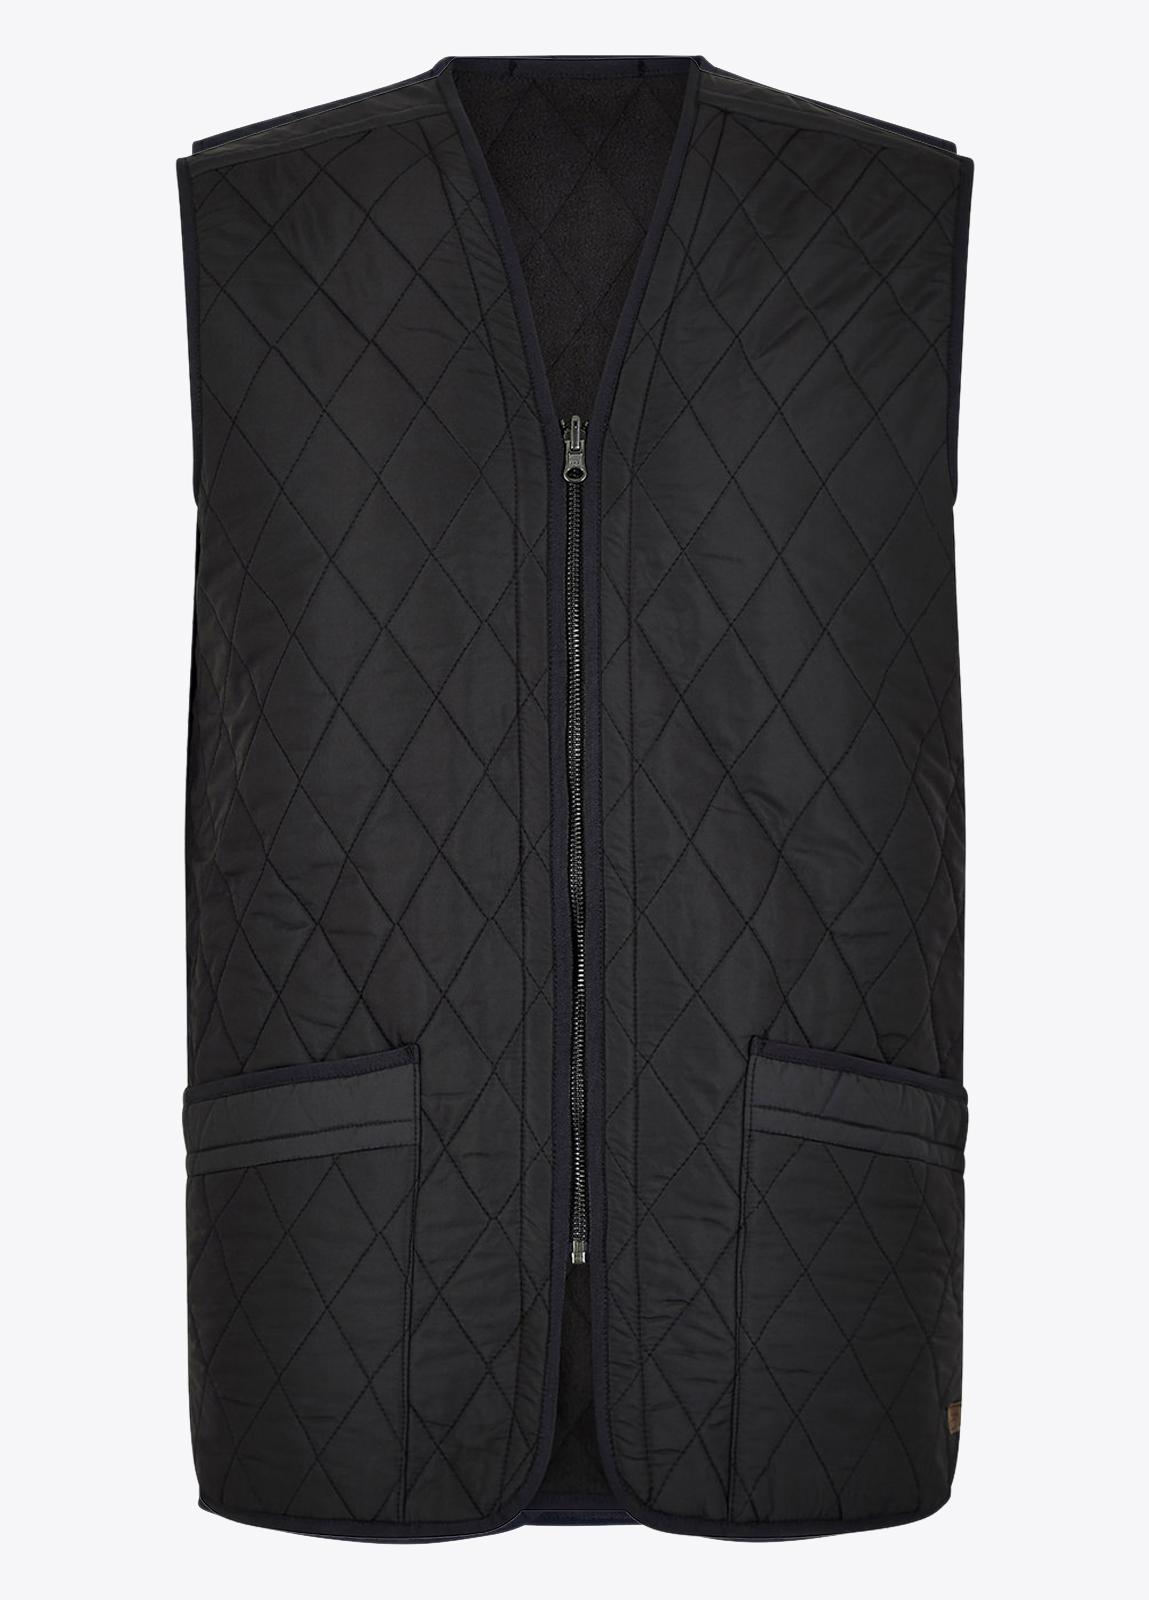 Ballygar_Quilted_Waistcoat_Black_on_model